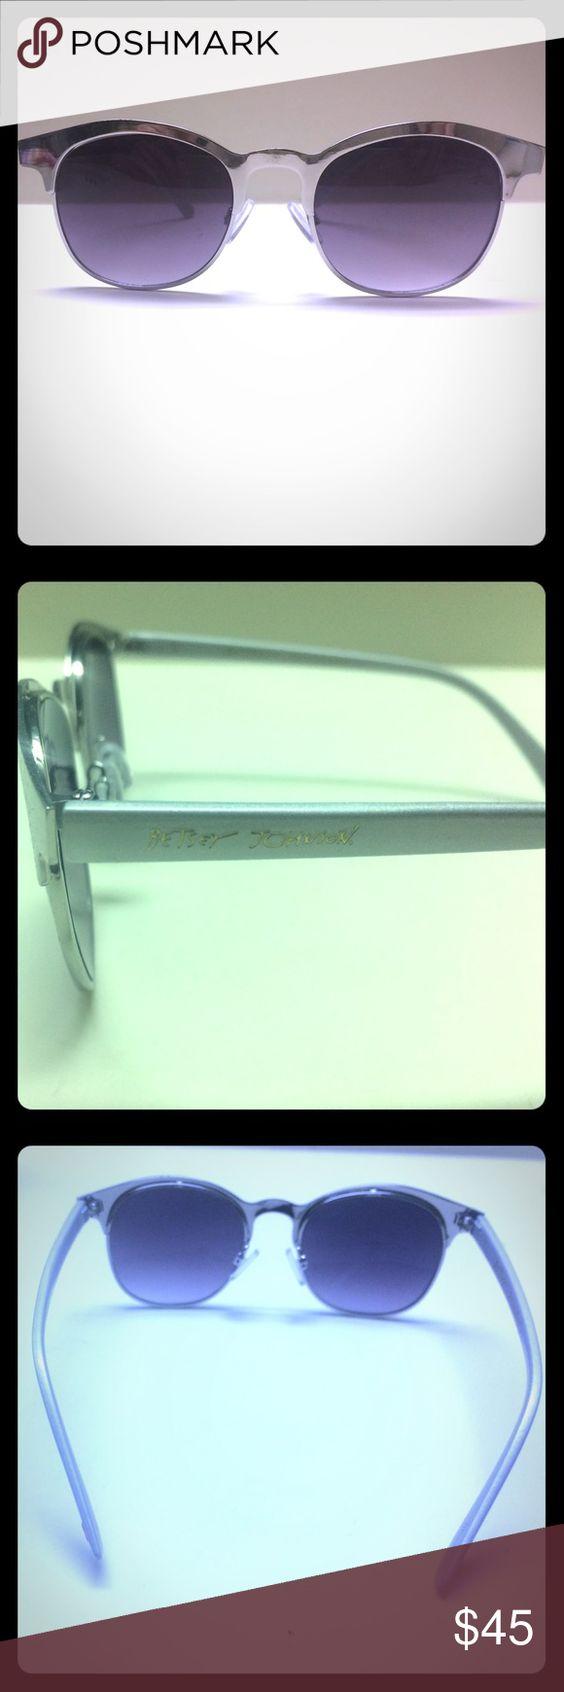 Like new Betsey Johnson sunglasses Silver framed sunglasses Betsey Johnson Accessories Sunglasses